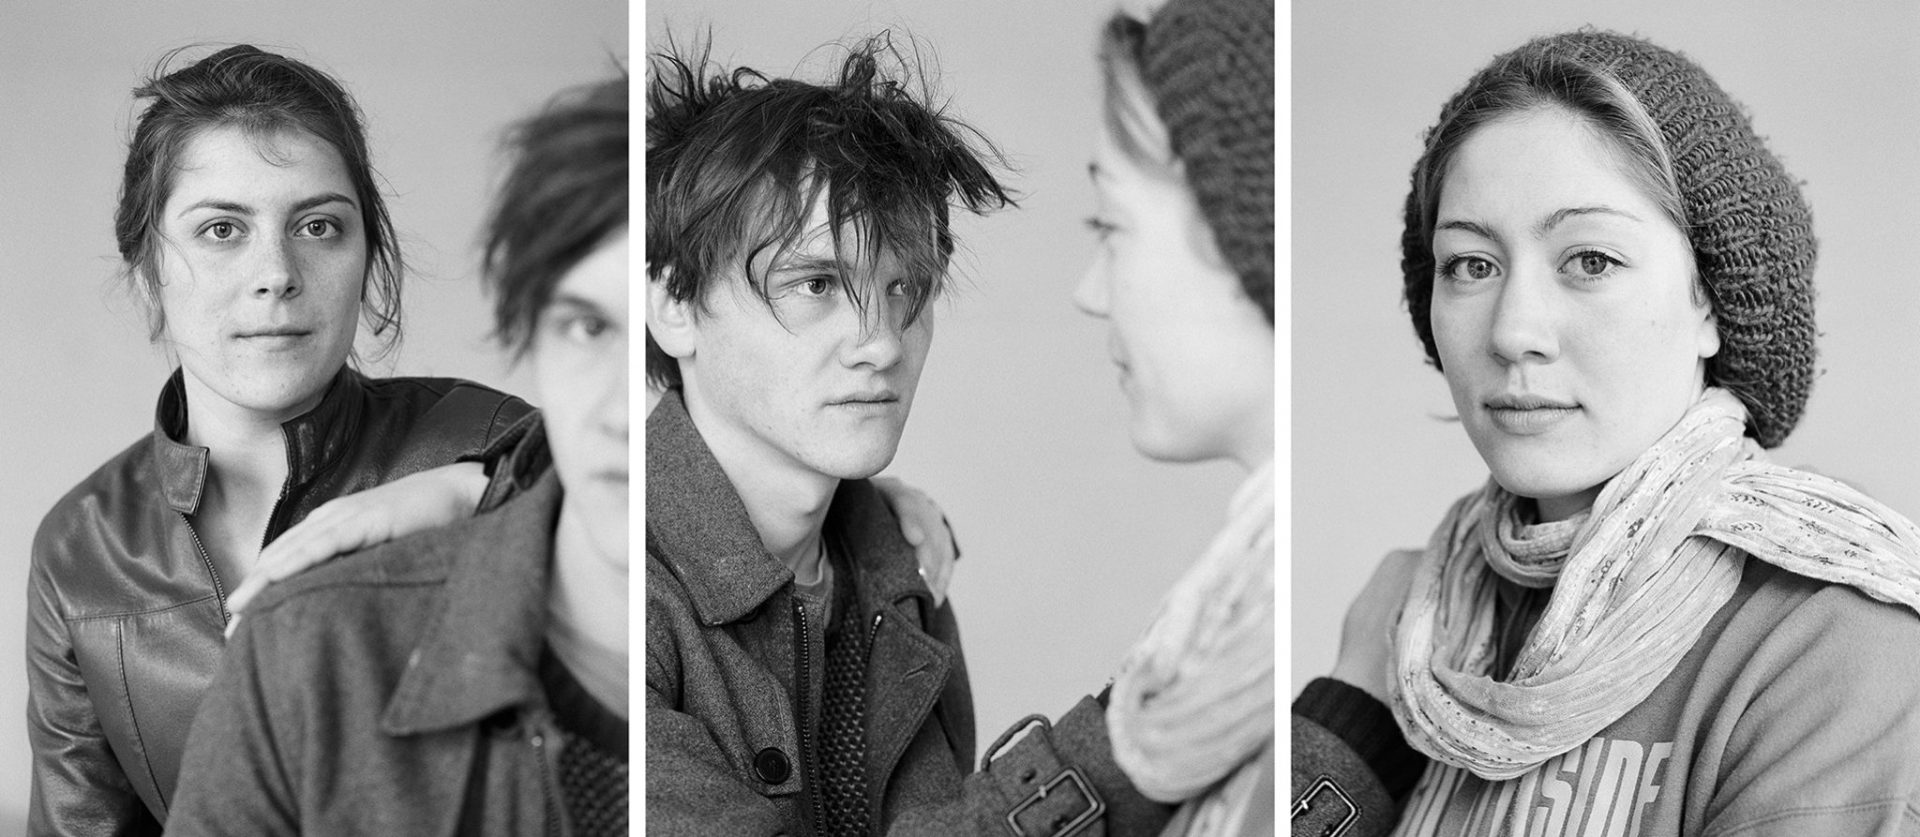 Laura, Jakob and Hannah, 2012 © Loredana Nemes